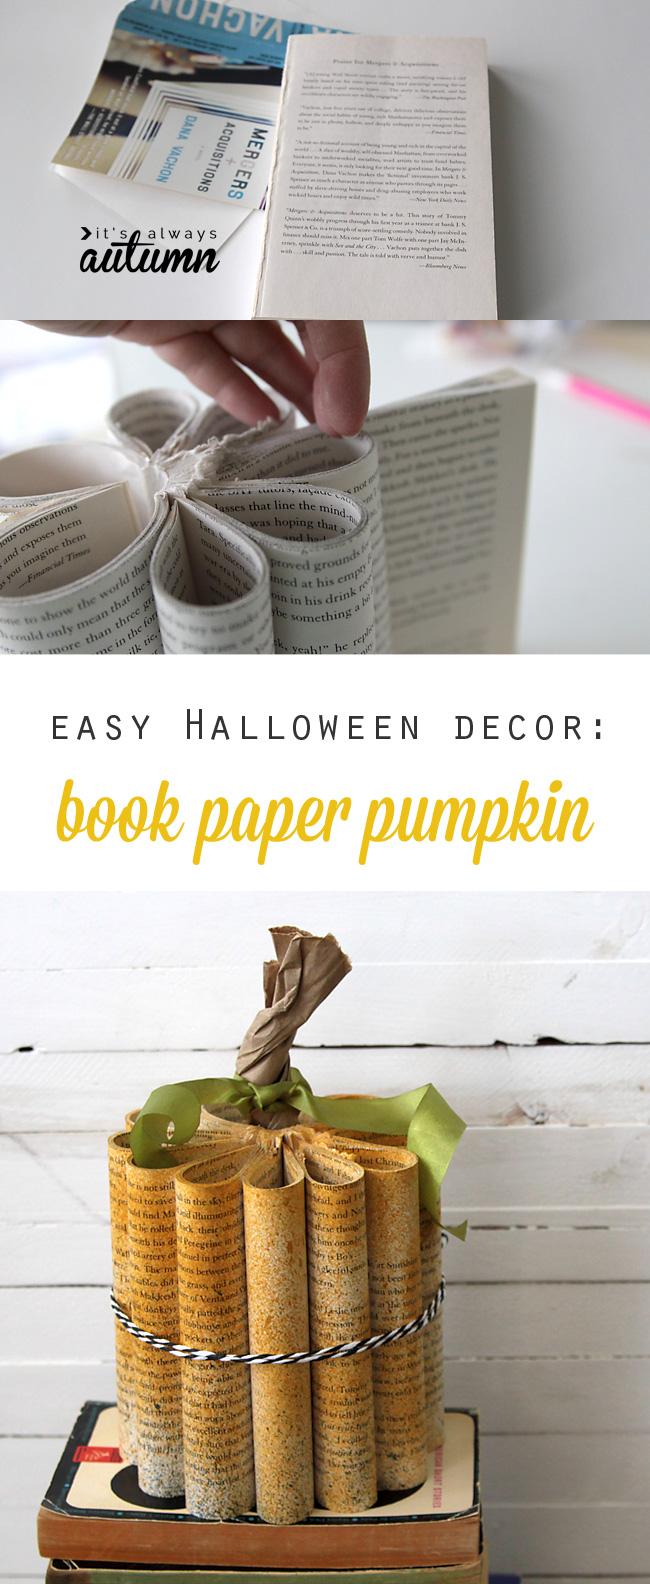 Fun new take on a book paper pumpkin! Easy DIY Halloween decoration.